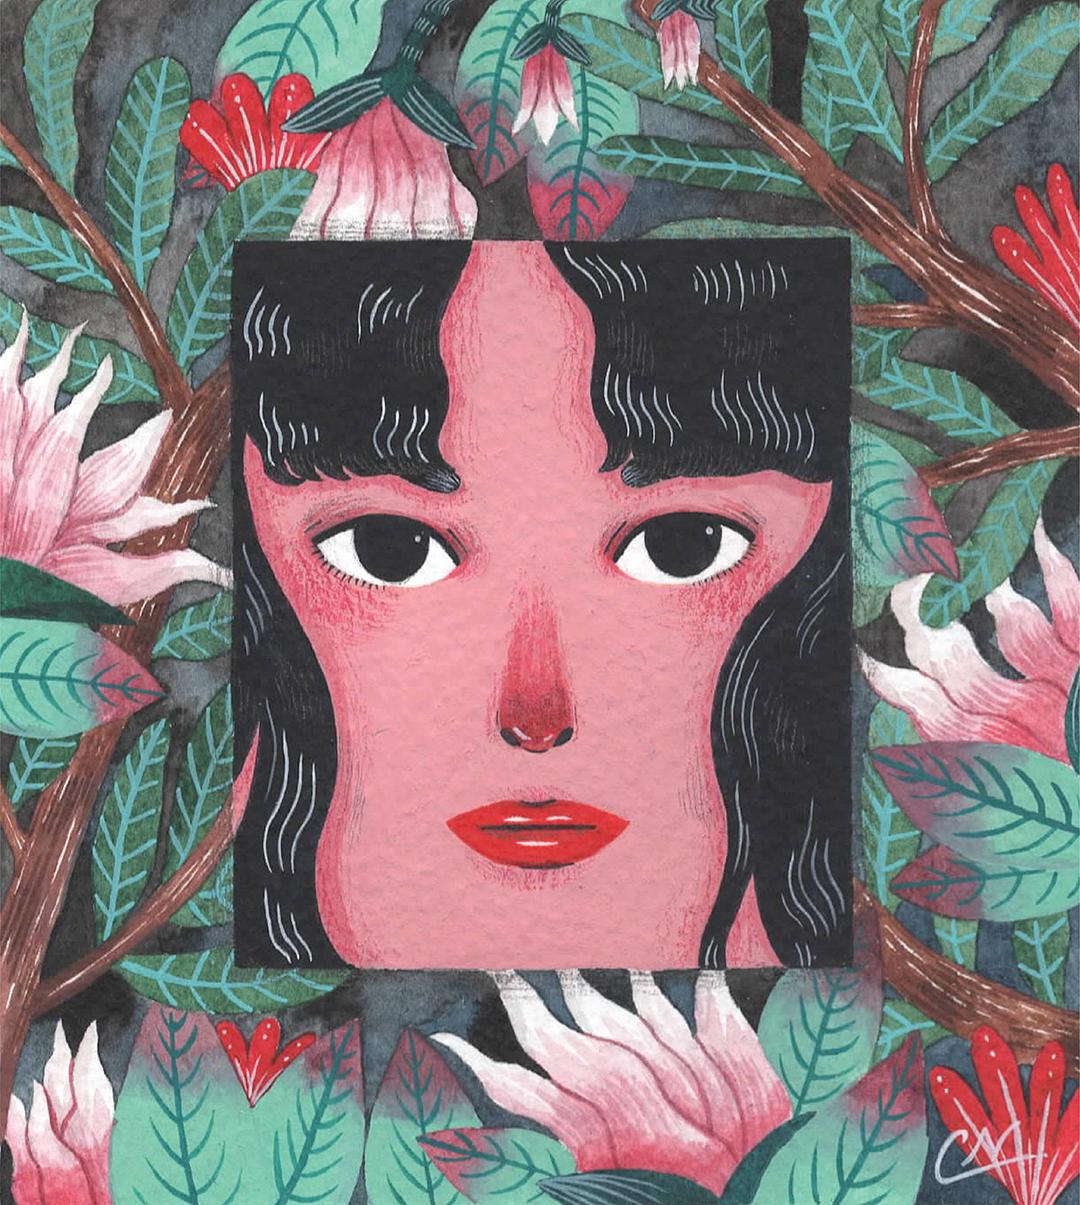 GirlsclubAsia-Illustrator-Chubbynida-artwork-08.jpg